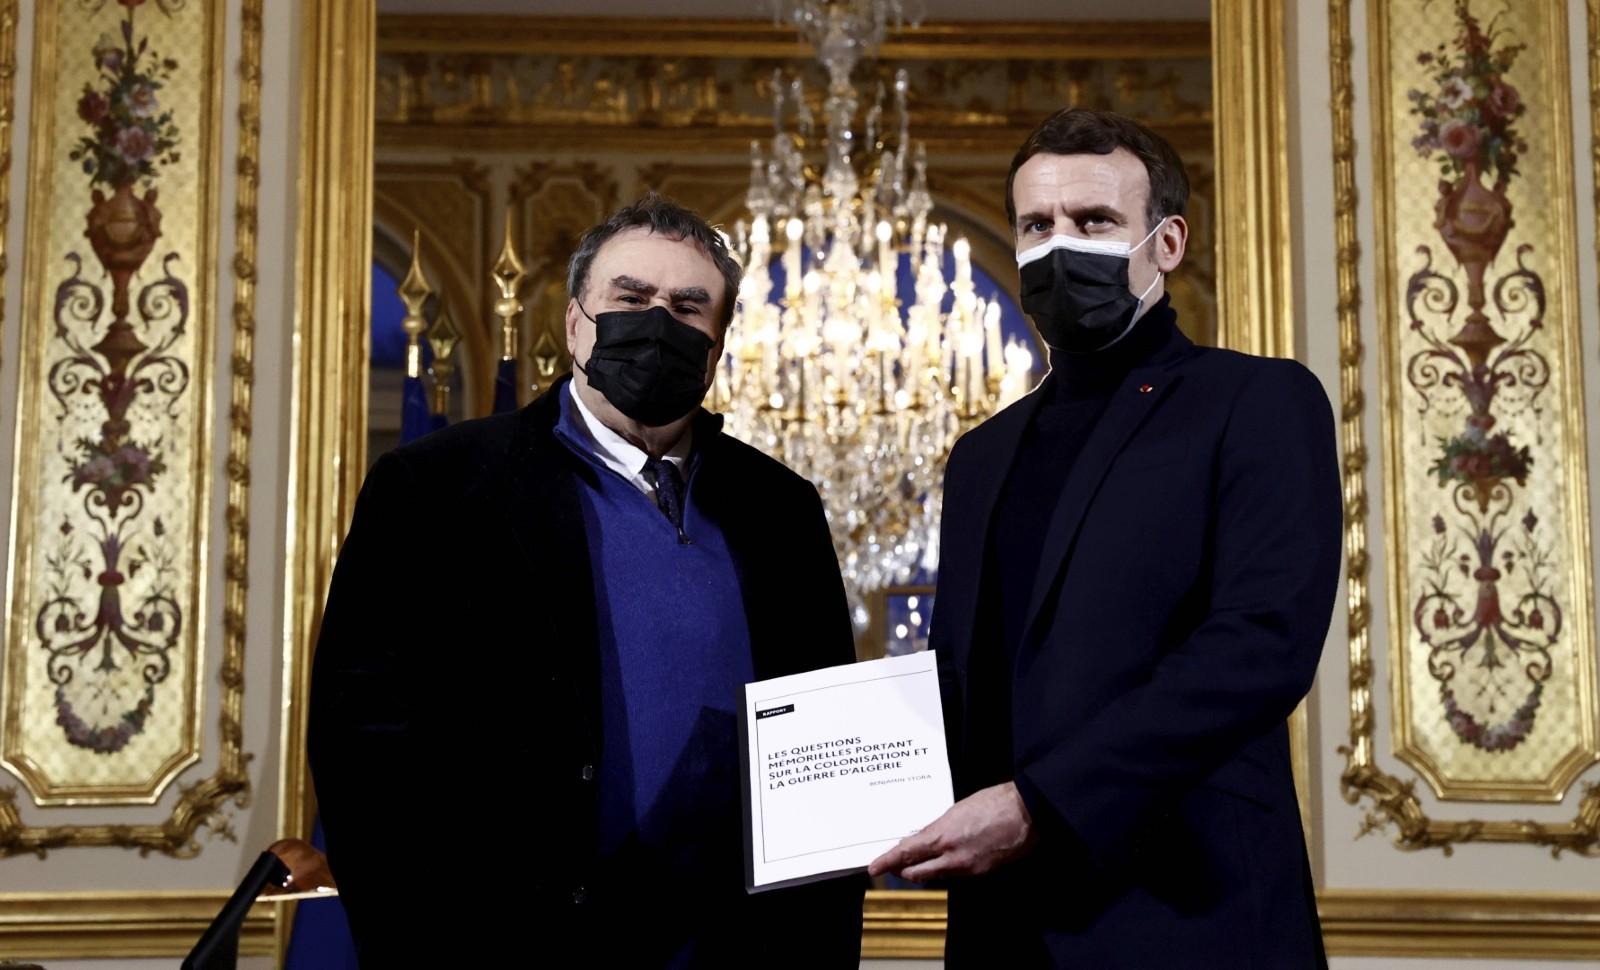 Benjamin Stora et Emmanuel Macron, janvier 2021 © Christian Hartmann/AP/SIPA Numéro de reportage : AP22544838_000001